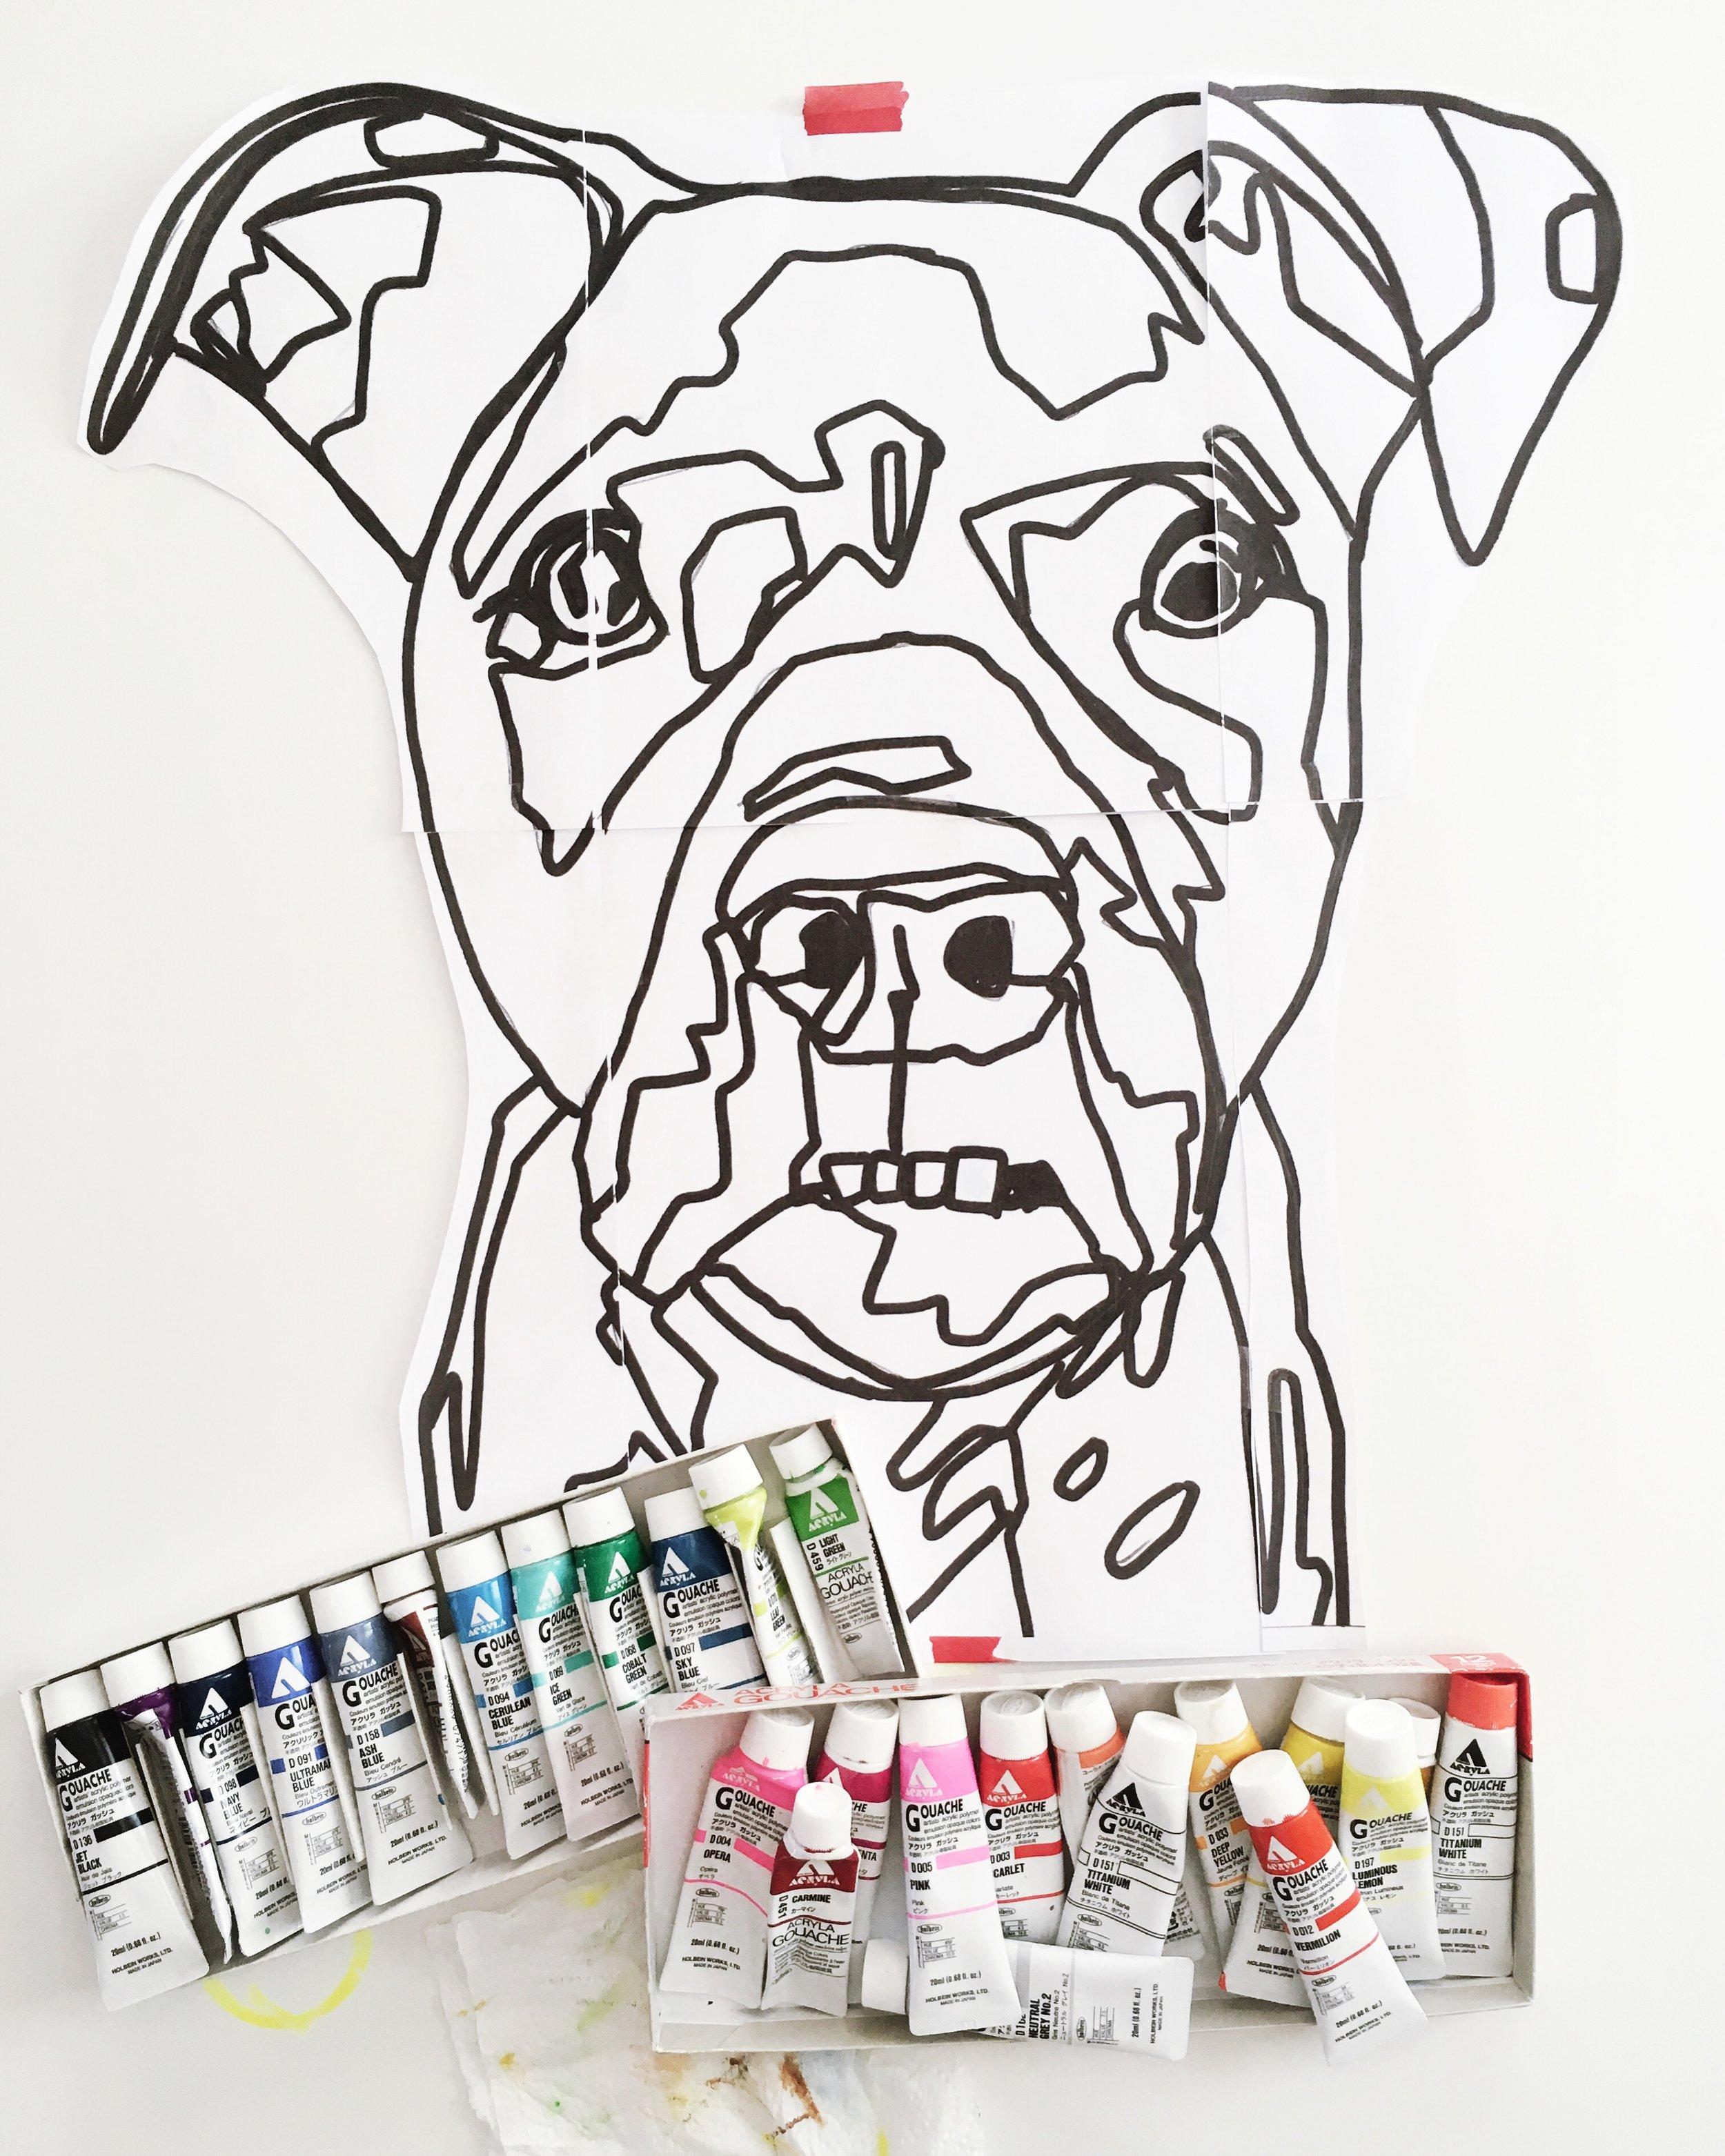 crystal moody | dog portrait in progress